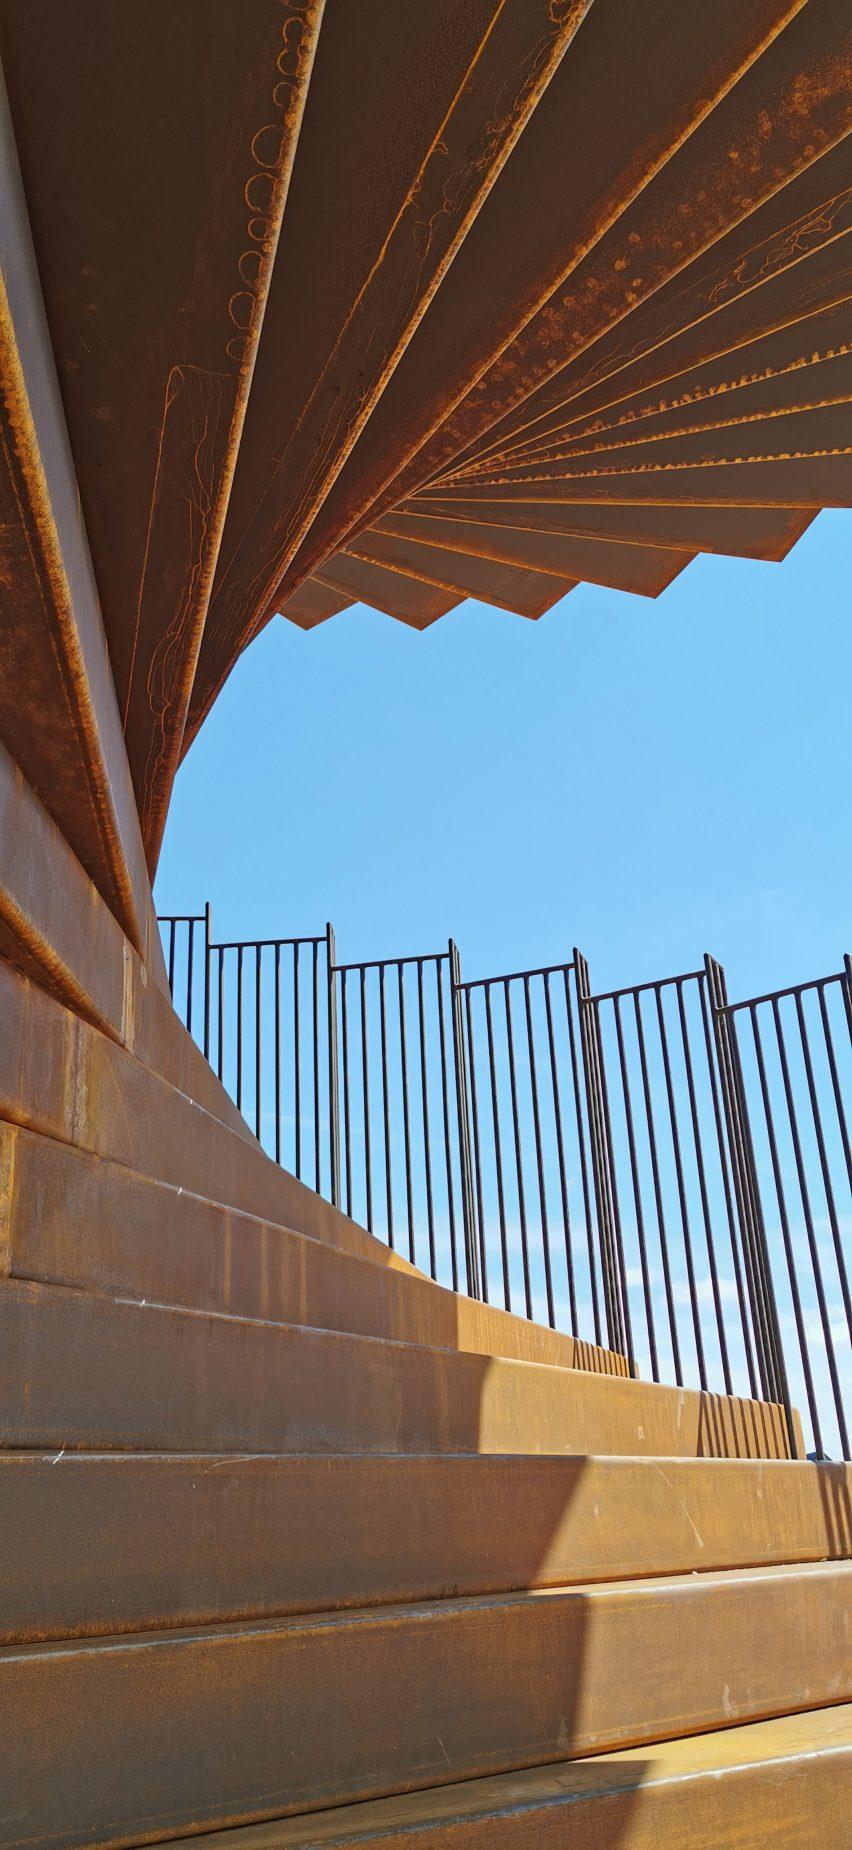 Steps in Camp Marsk viewing tower